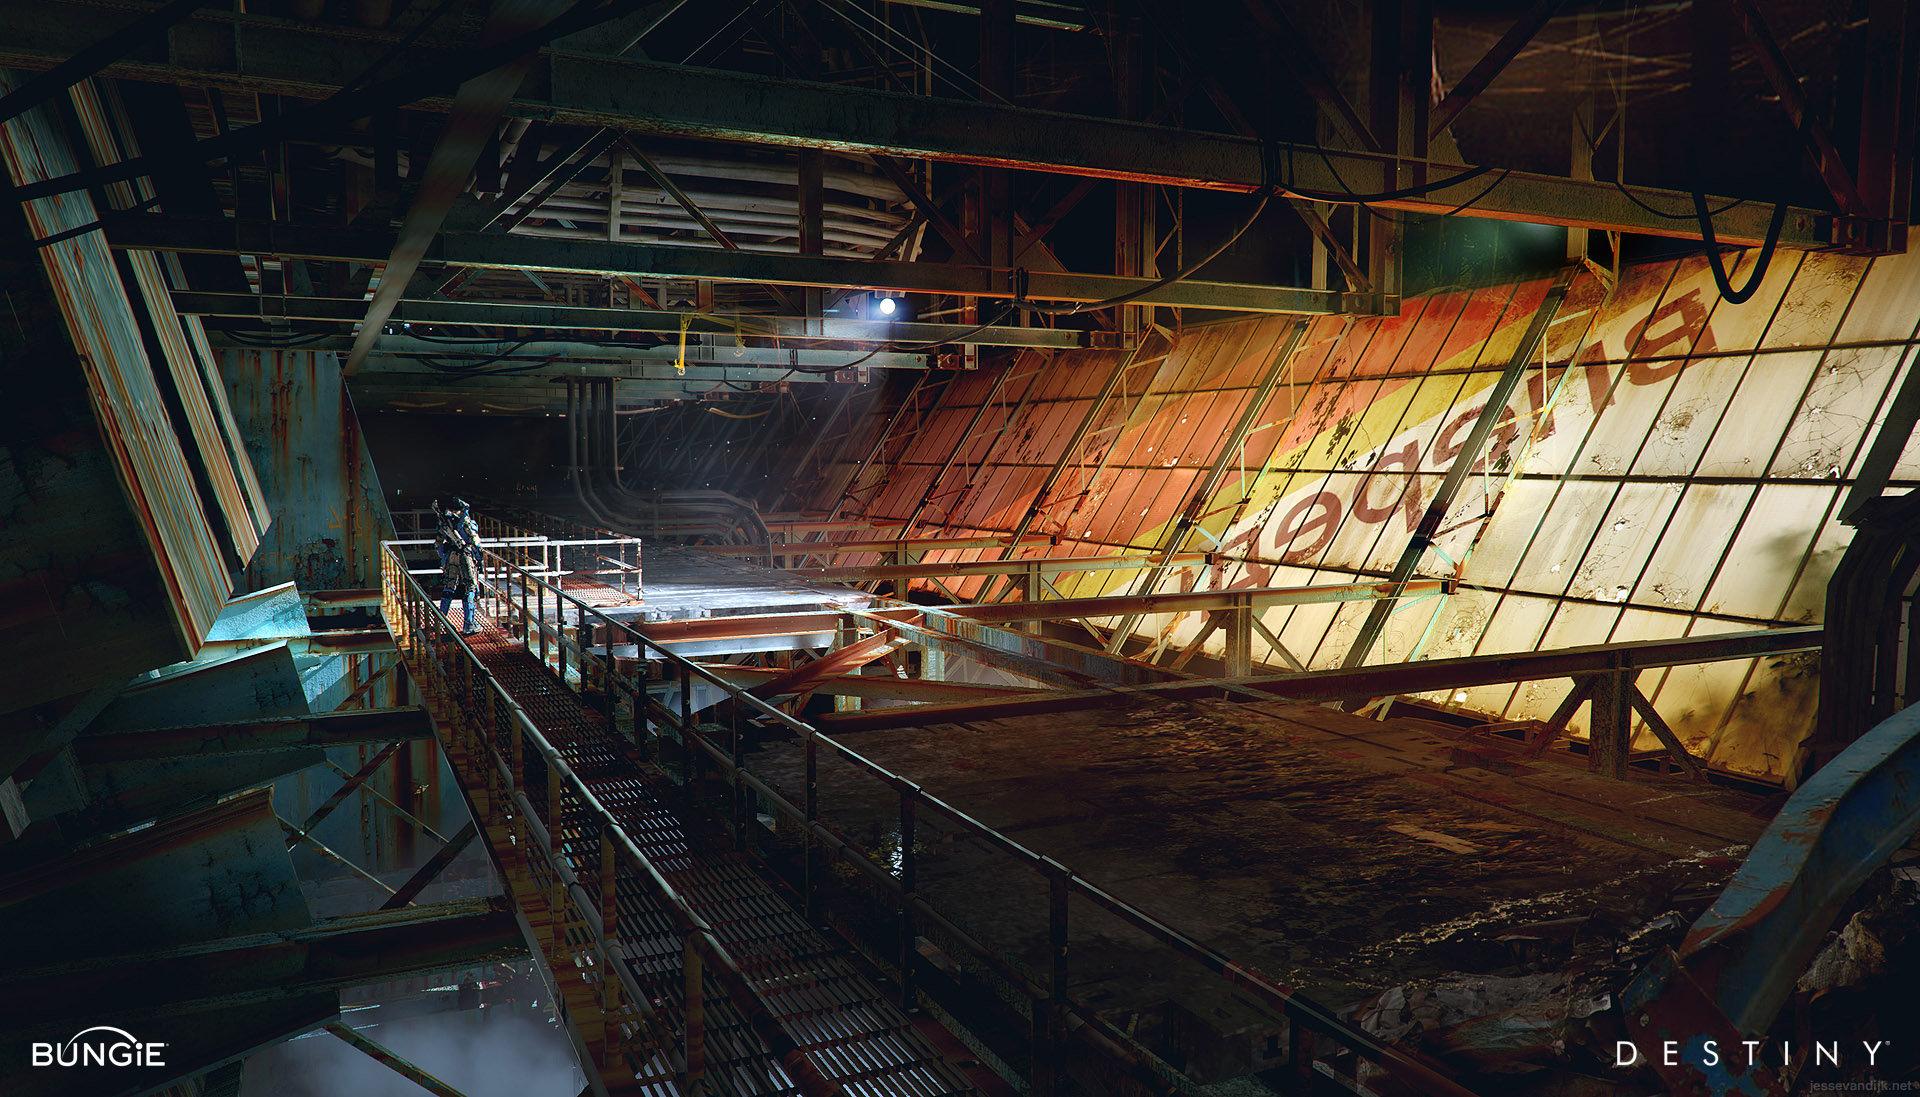 ArtStation  Destiny Inside the Cosmodrome Wall Jesse